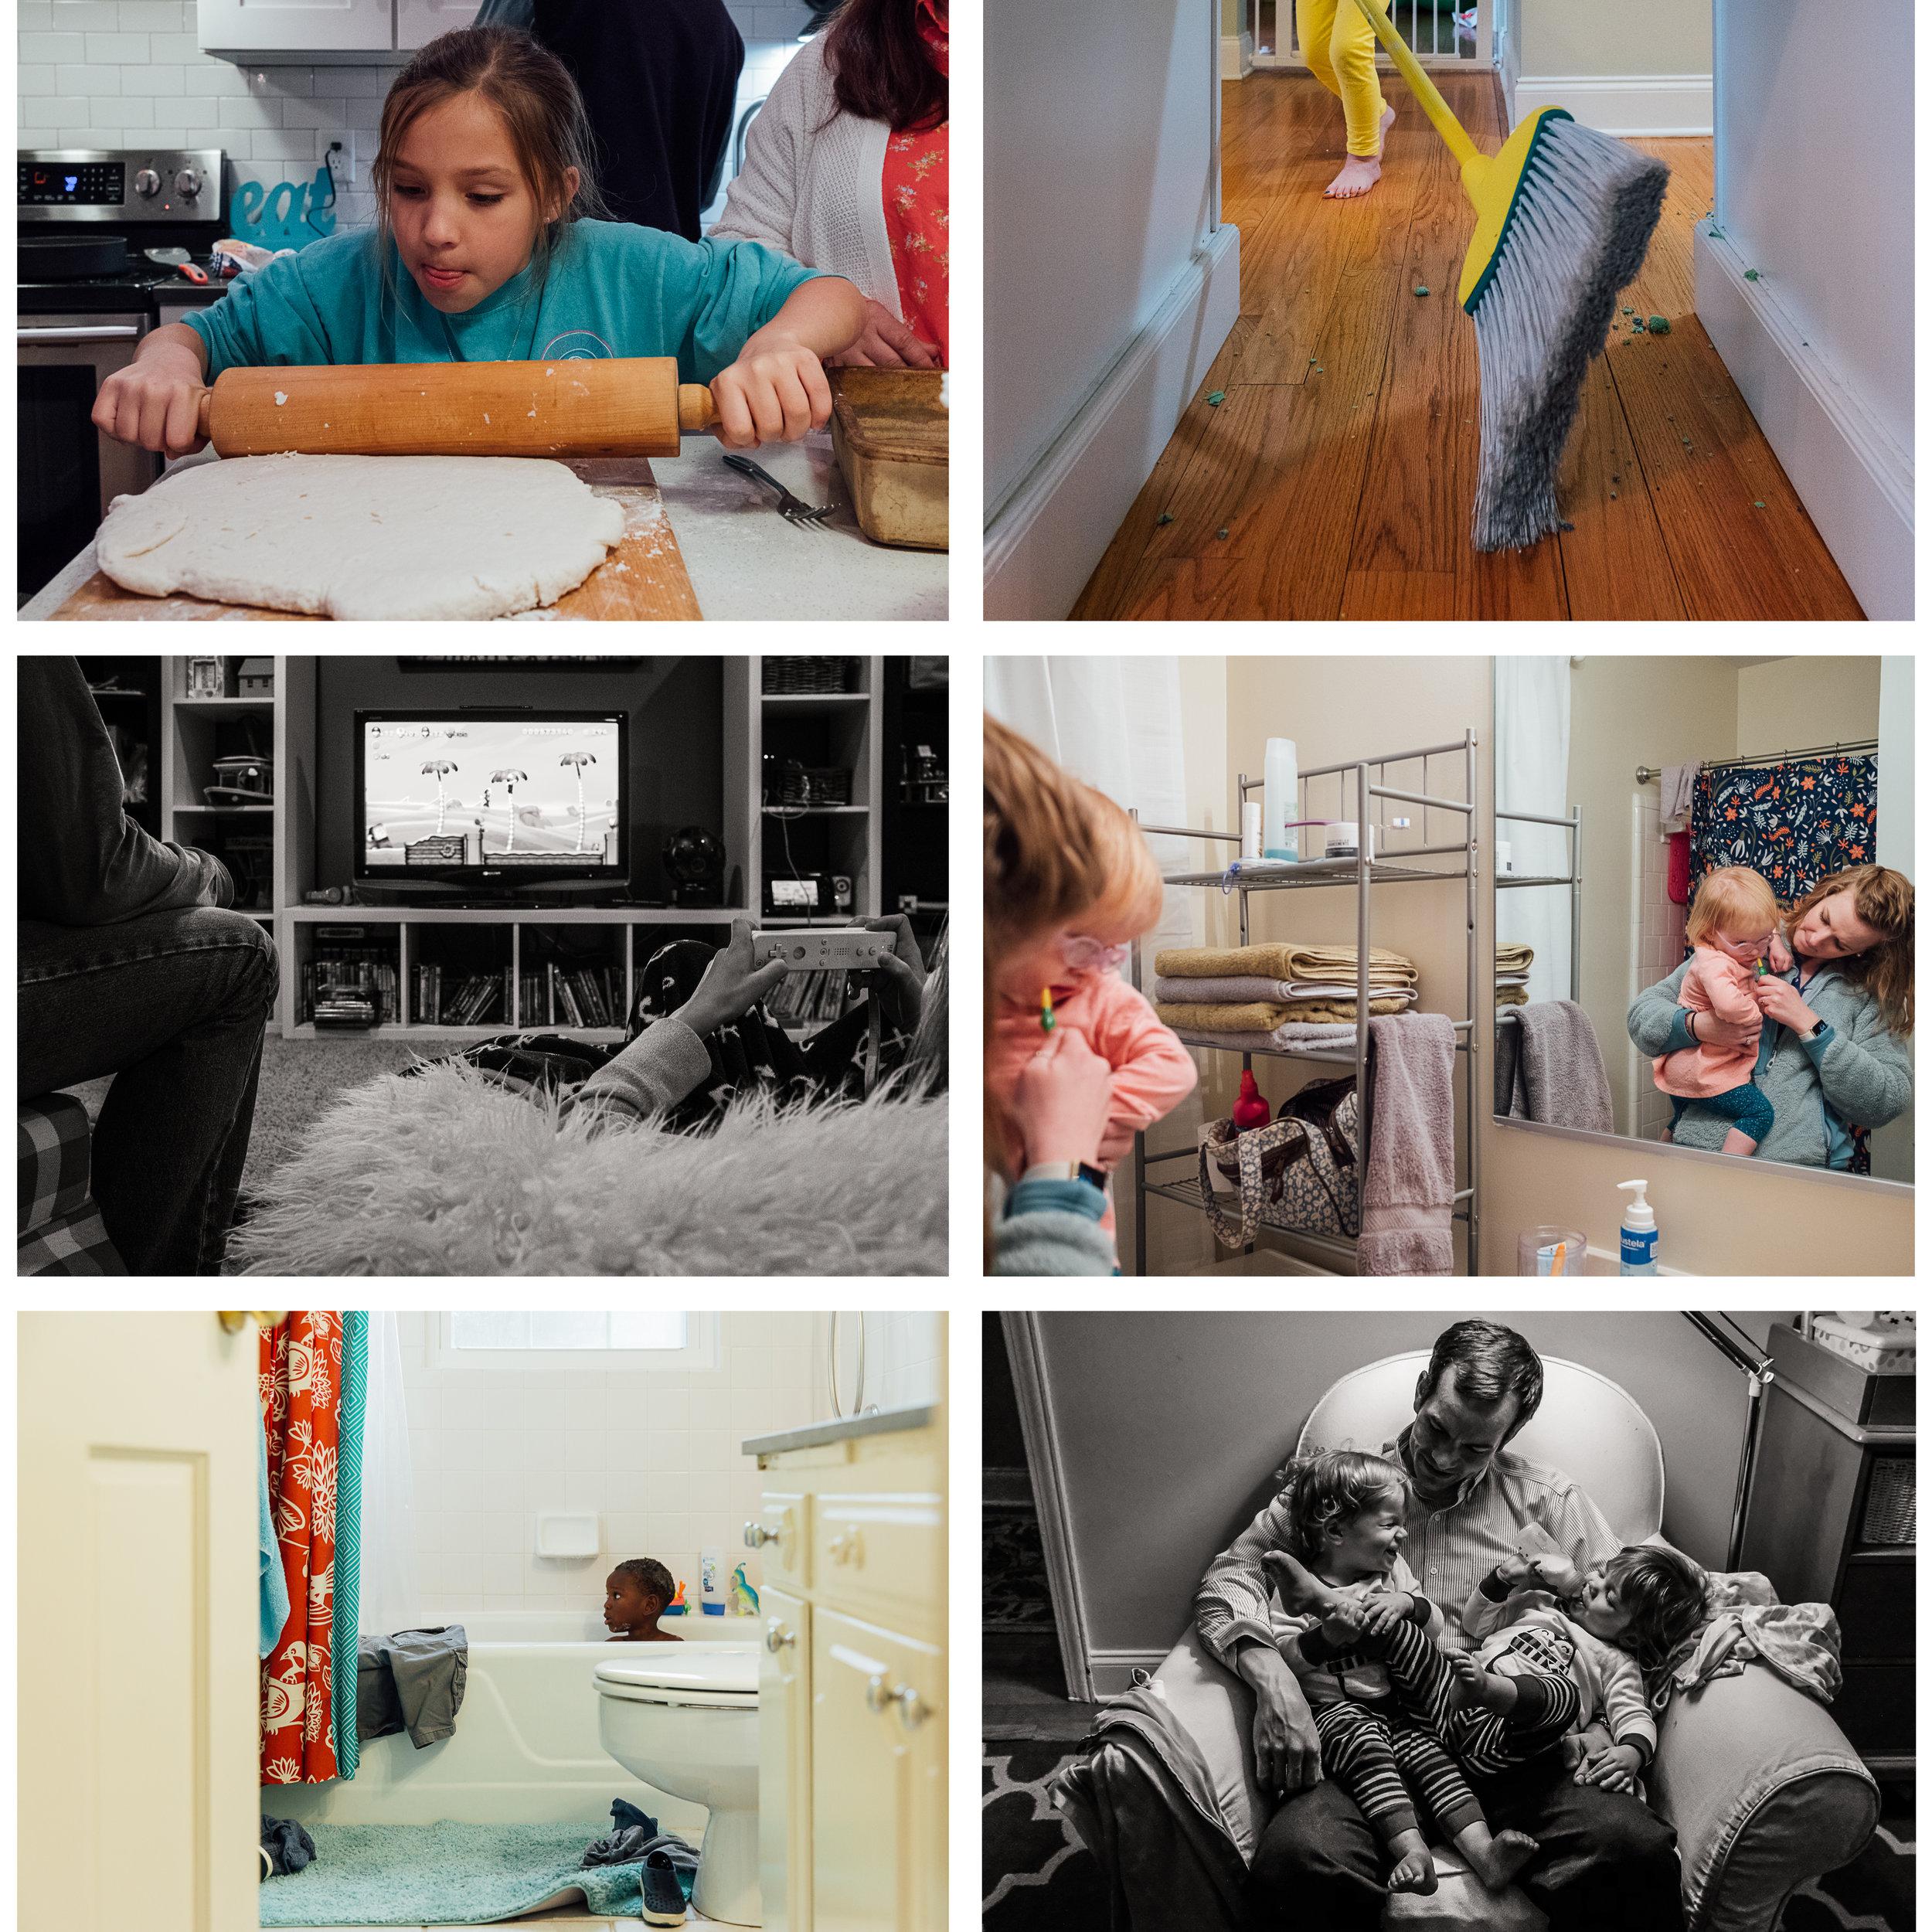 At Home - Cook/bakeDo choresWork on homeworkRead booksPlay gamesBathe the kidsDo the bedtime routine